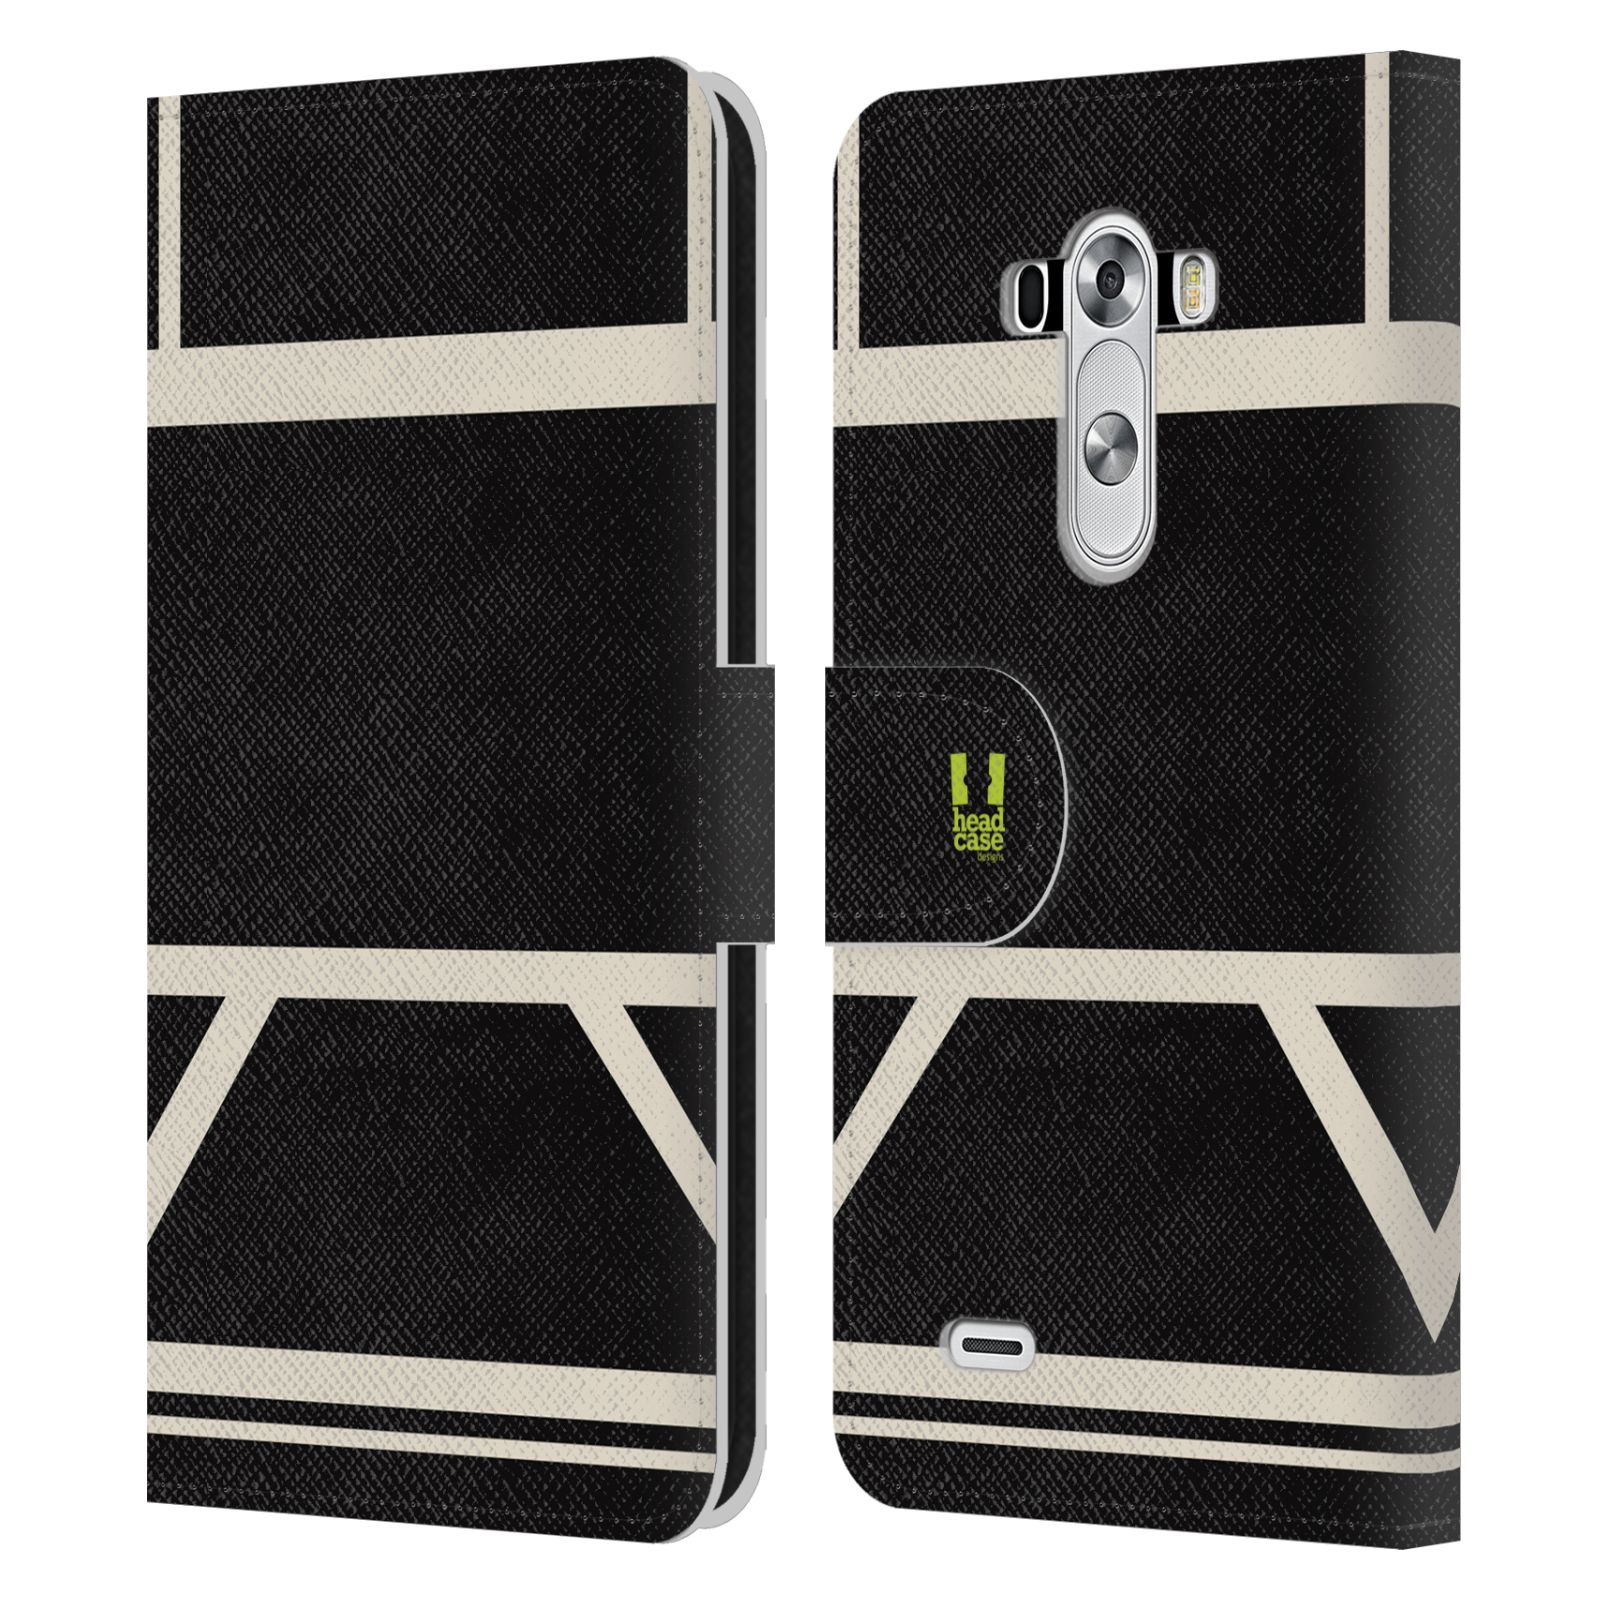 HEAD CASE Flipové pouzdro pro mobil LG G3 barevné tvary černá a bílá proužek